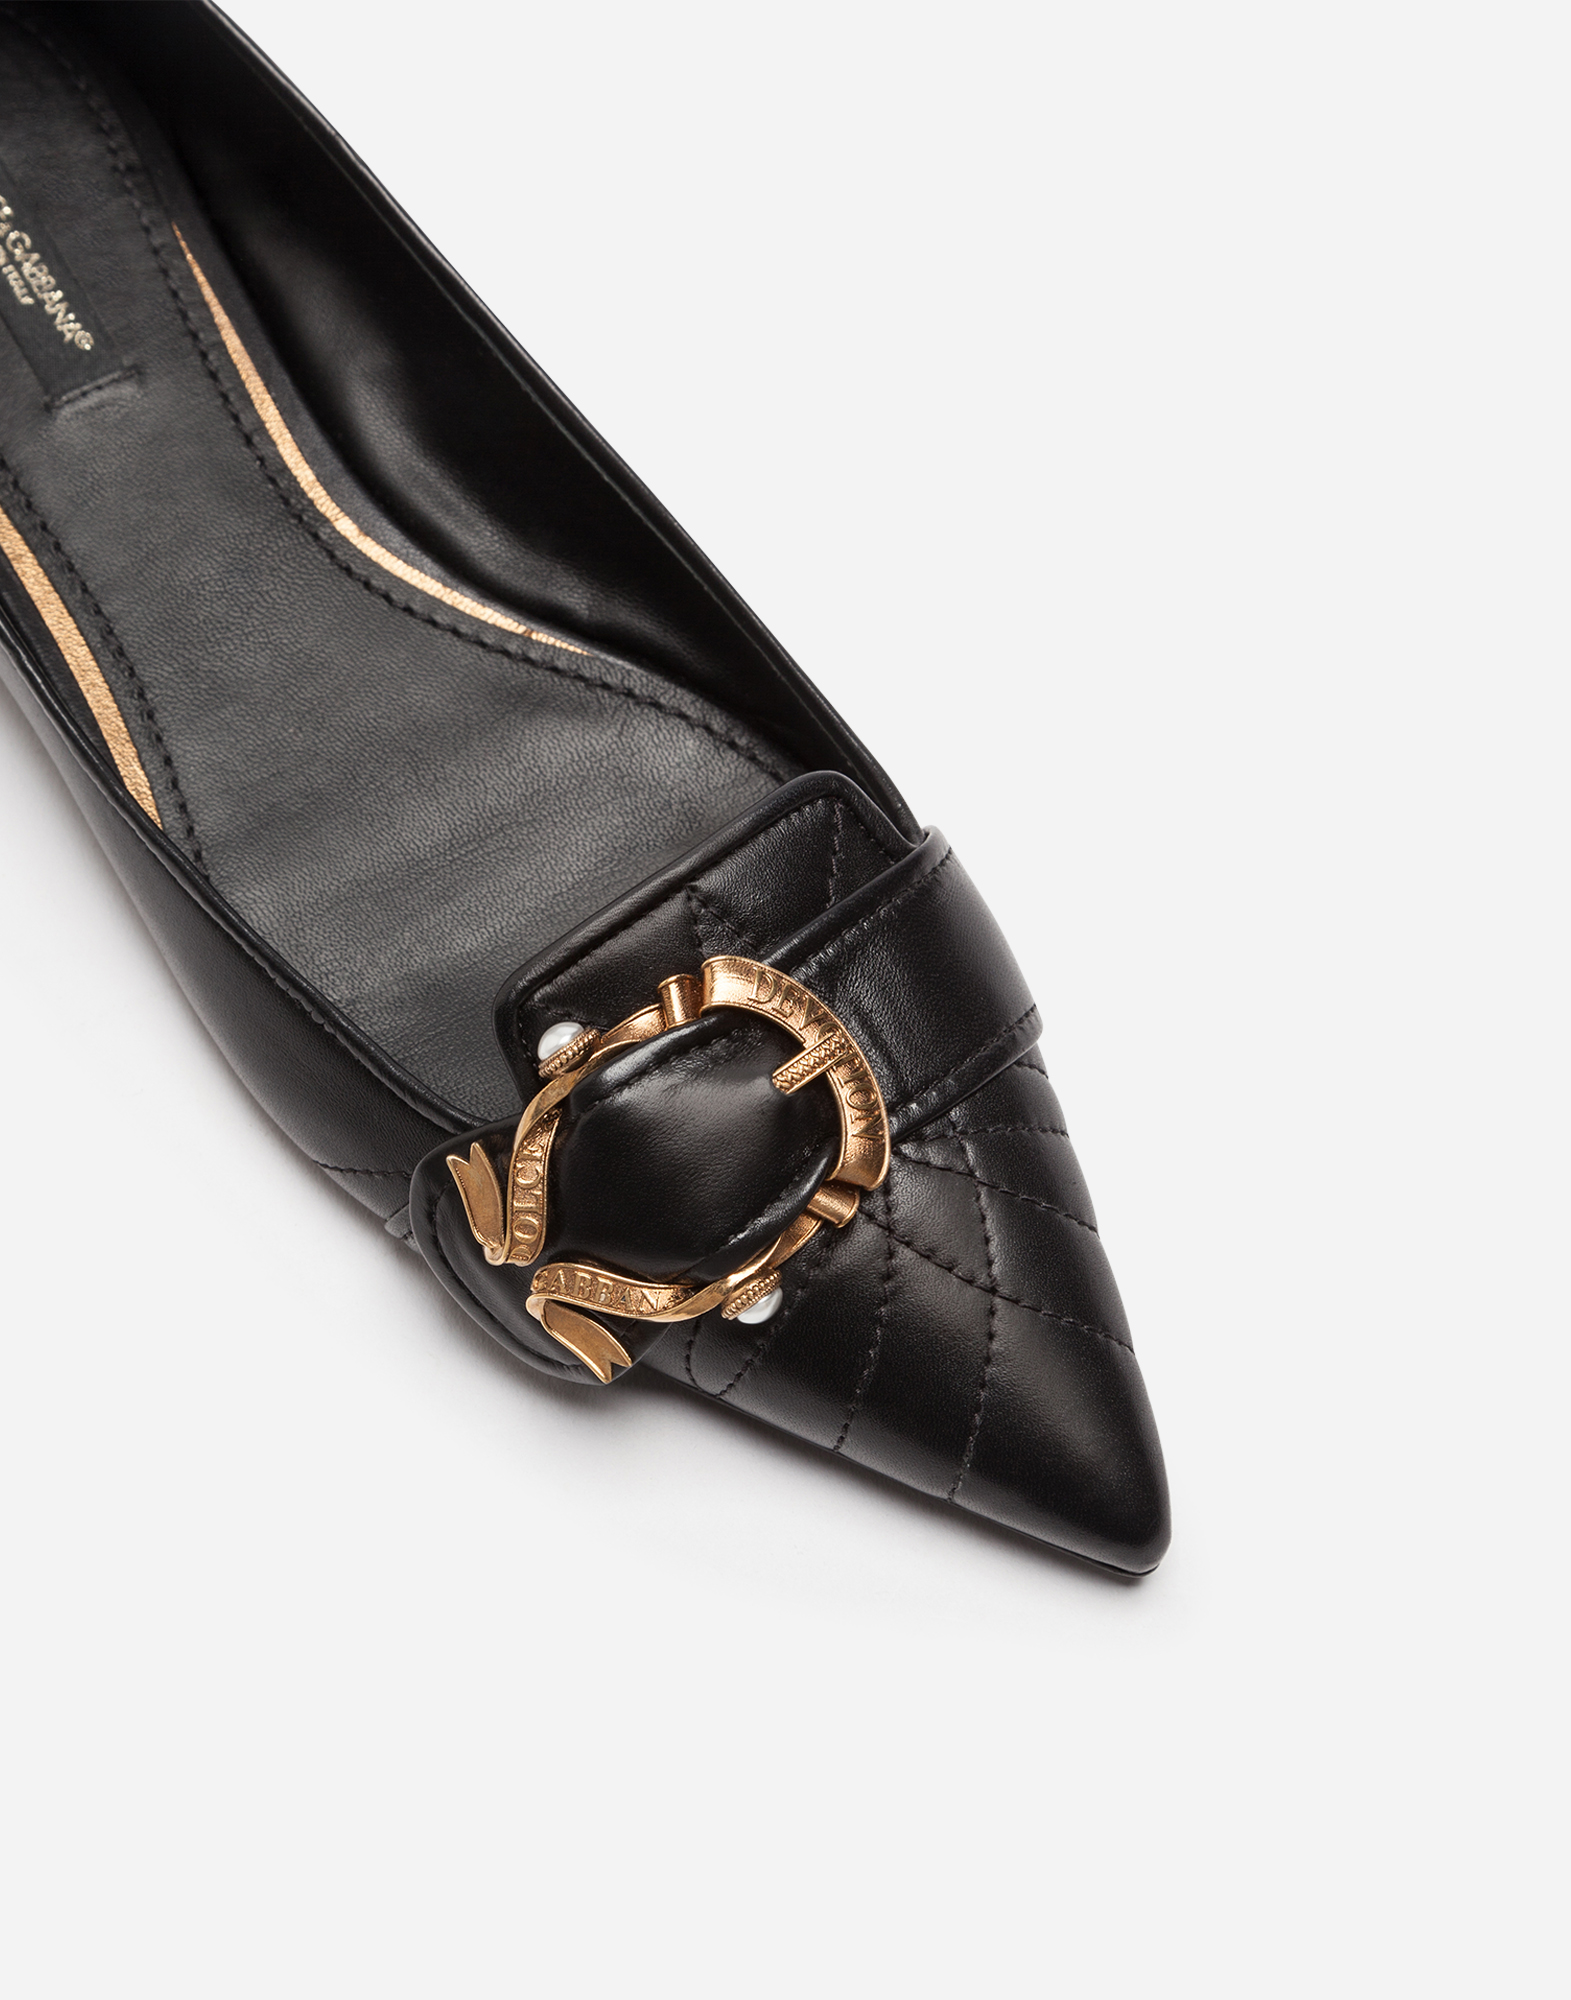 Dolce & Gabbana DEVOTION BALLET FLATS IN MATELASSÉ NAPPA LEATHER